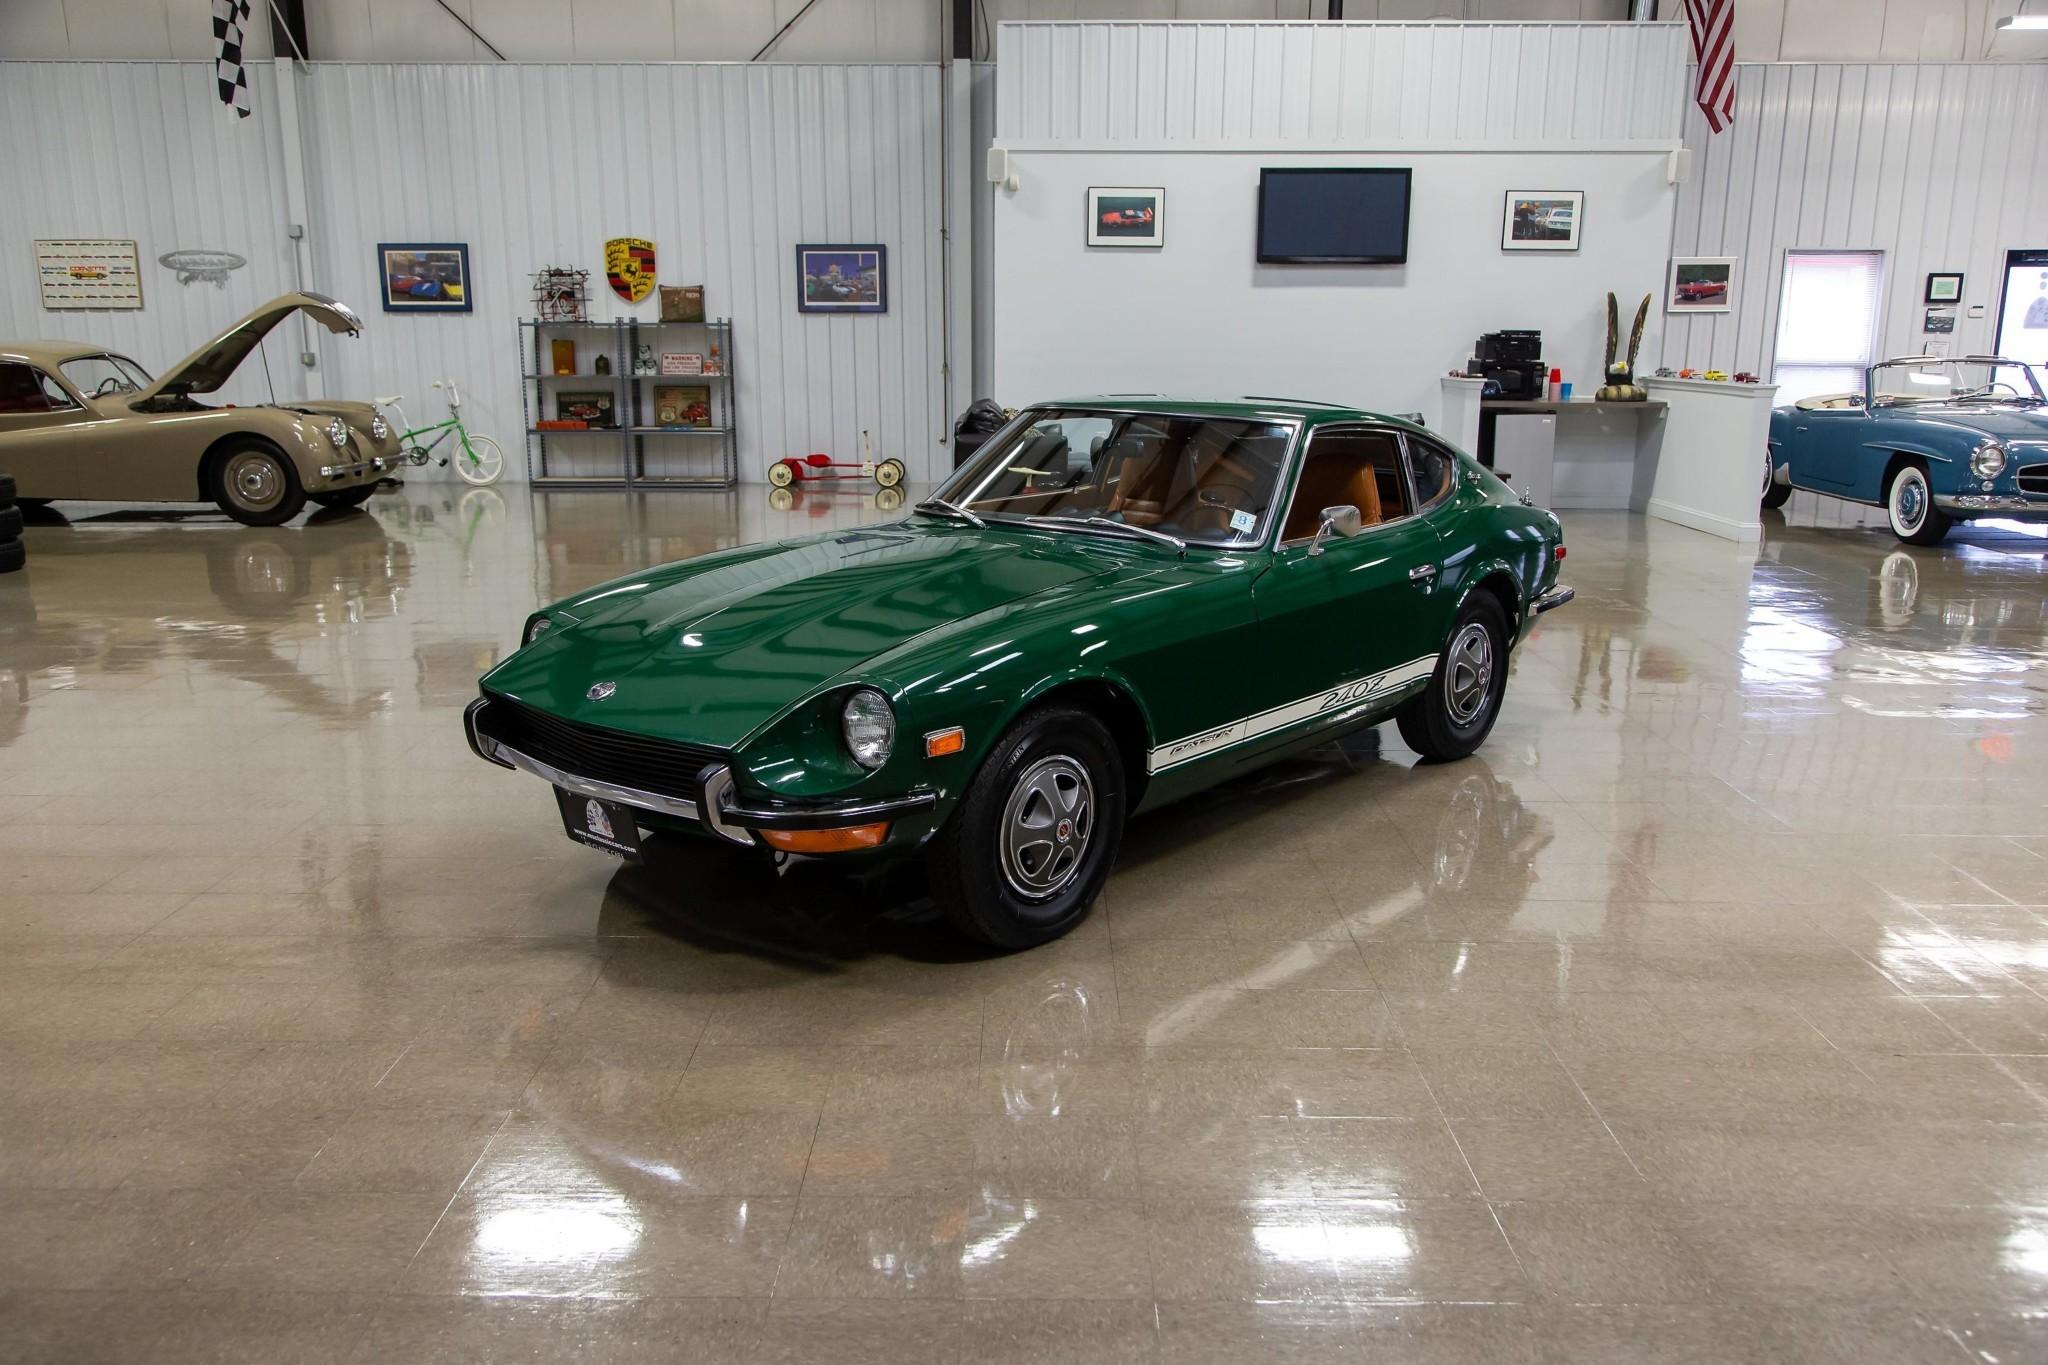 low-mileage-1971-datsun-240z-looks-all-original-sold-for-bentley-mulsanne-money_17